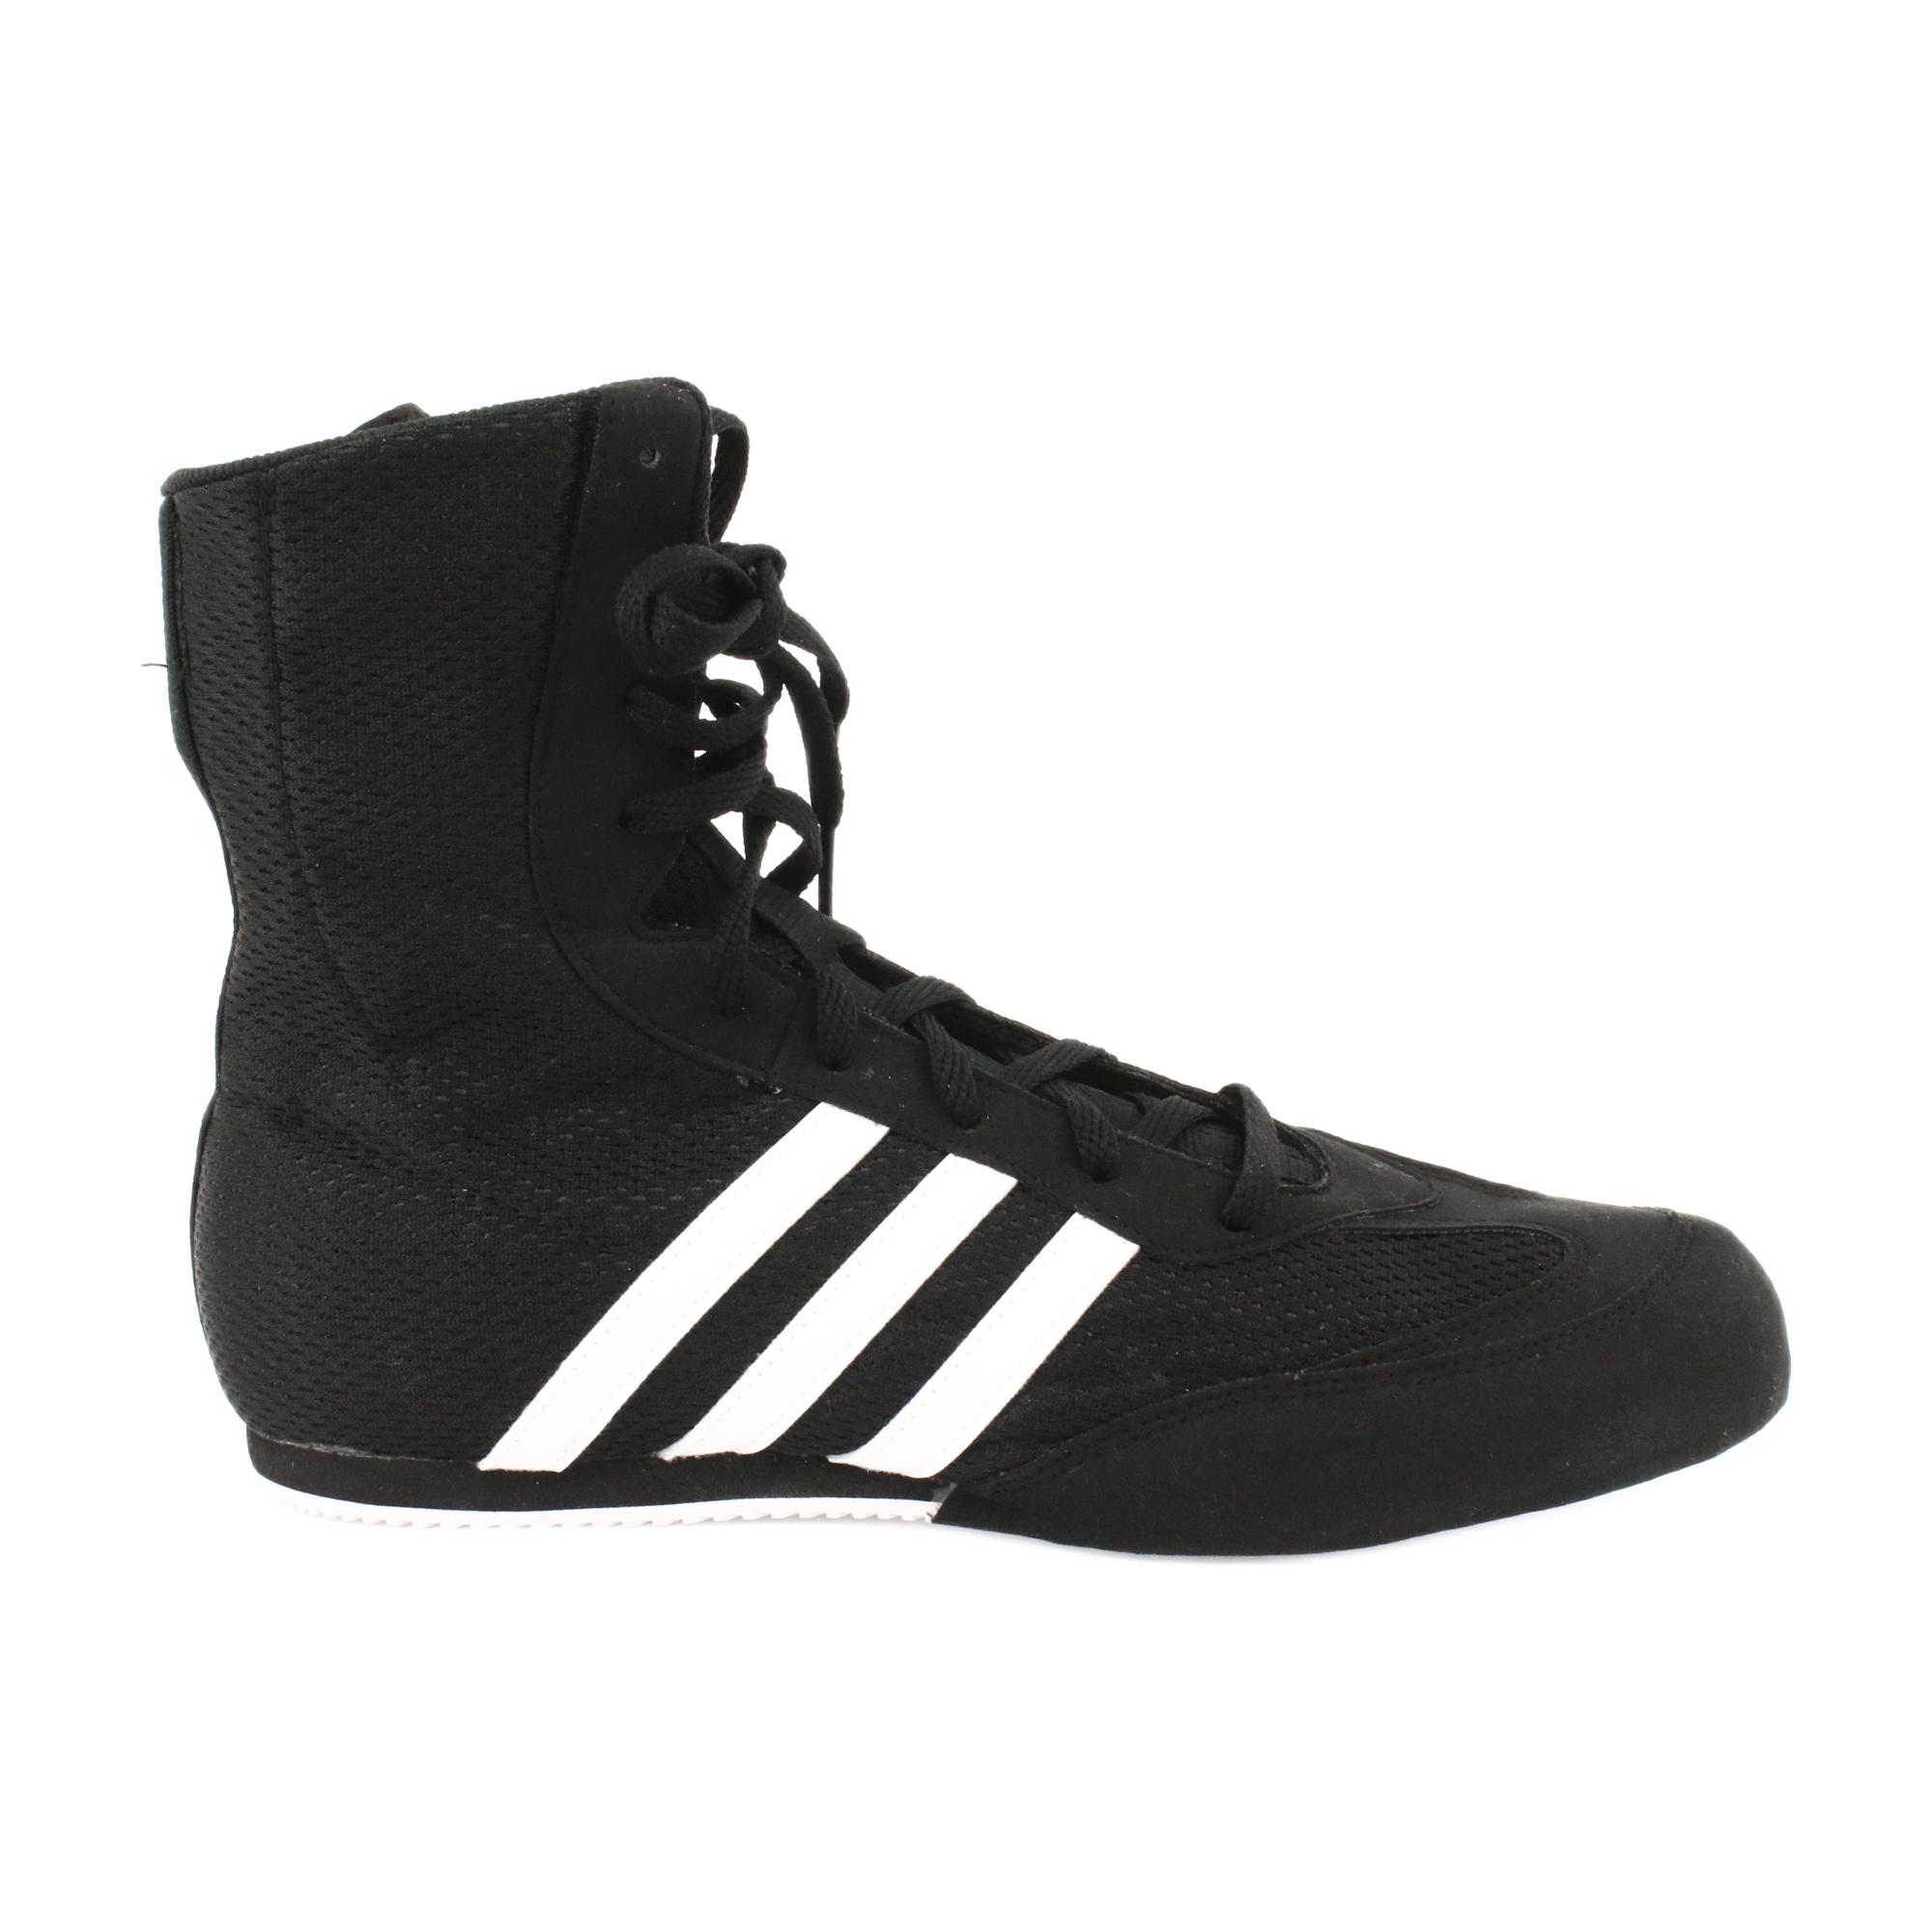 Noir adidas box hog ii boxing chaussures